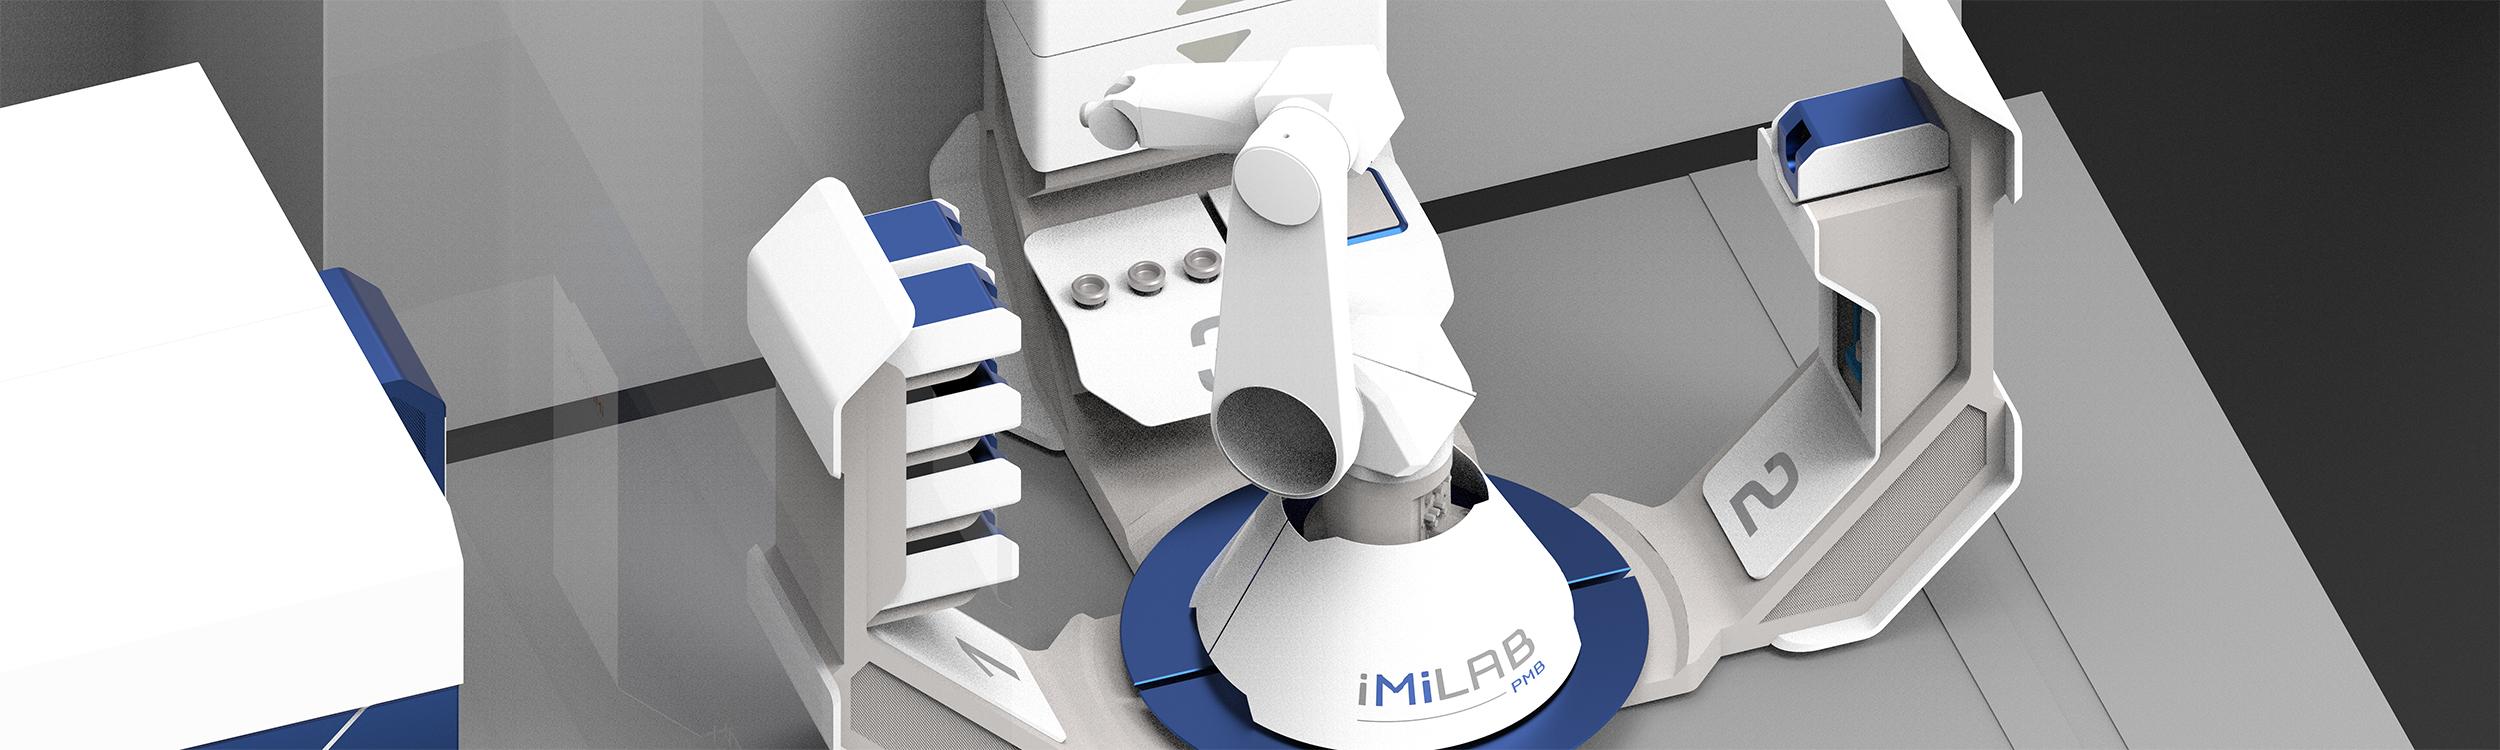 imilab radiochemistry microfluidic synthesis radiopharmaceuticals pet imaging imagine PMB Alcen